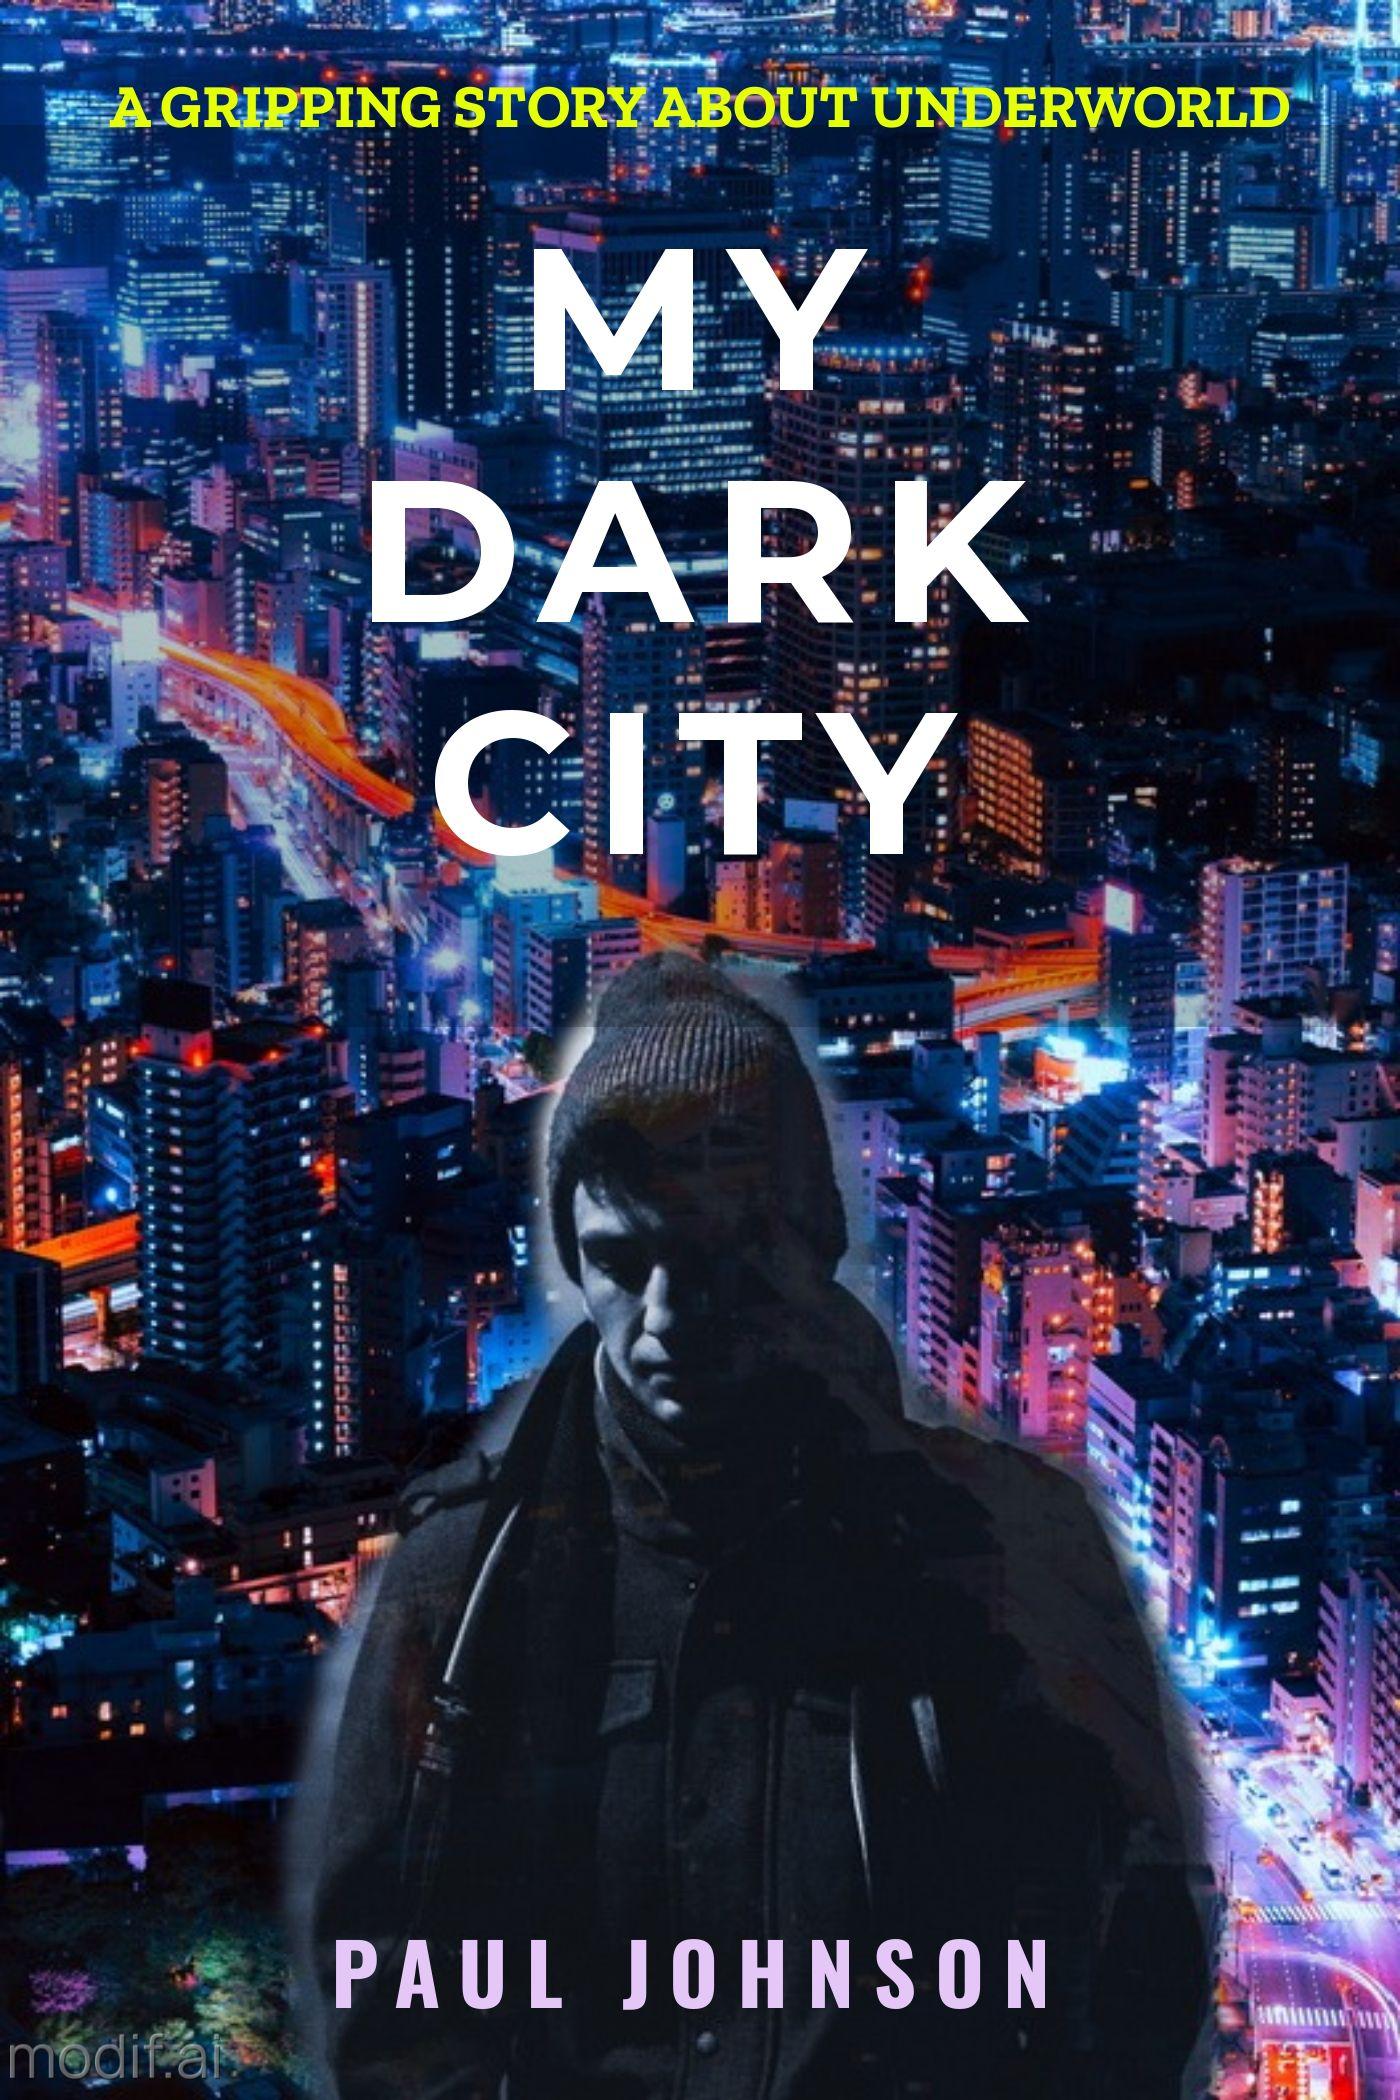 Urban City Book Cover Template